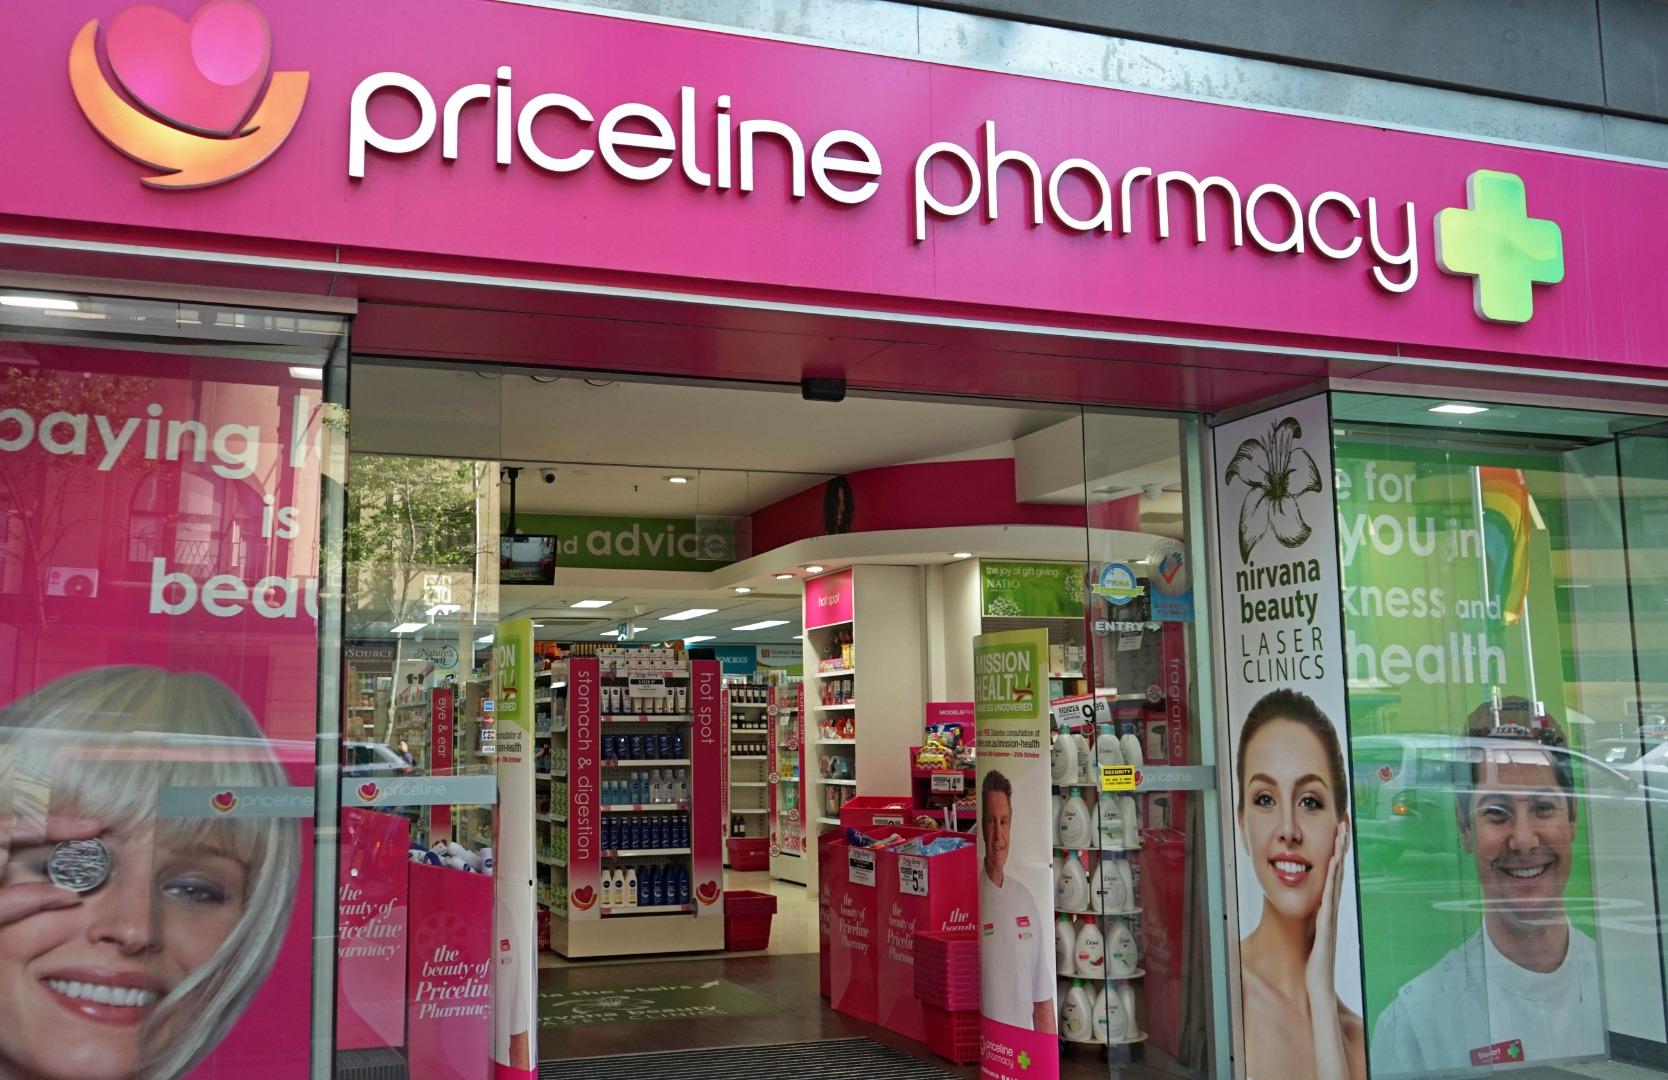 Famous Price Back Half Is Sale Perfume Priceline's 3L4jR5A